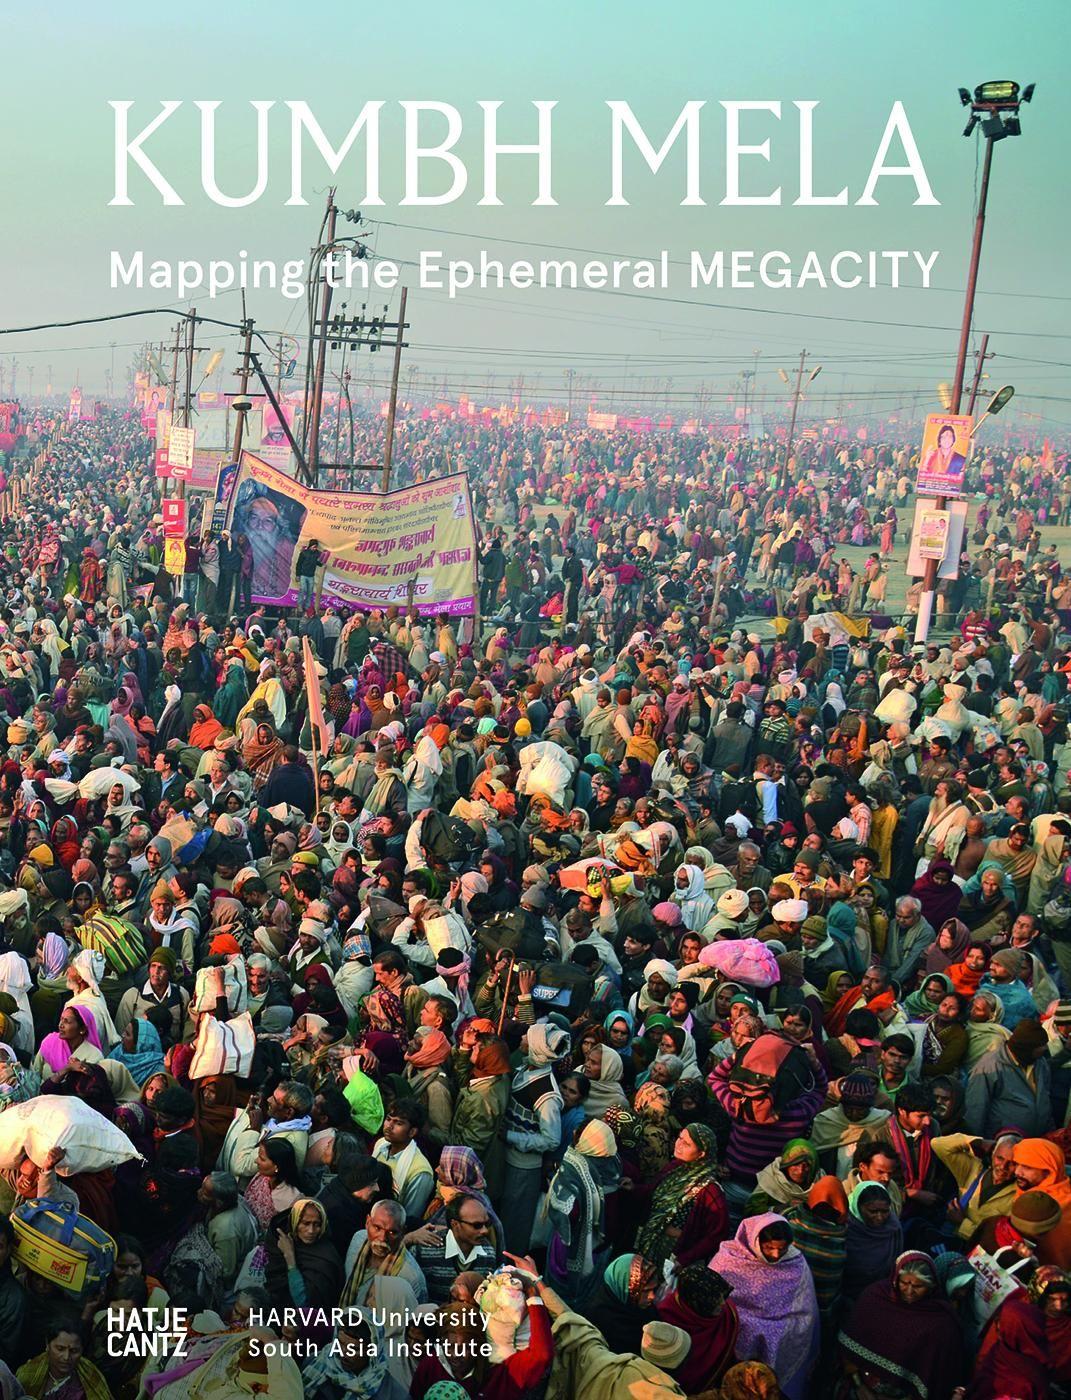 Kumbh Mela, January 2013 | Architecture | Hatje Cantz